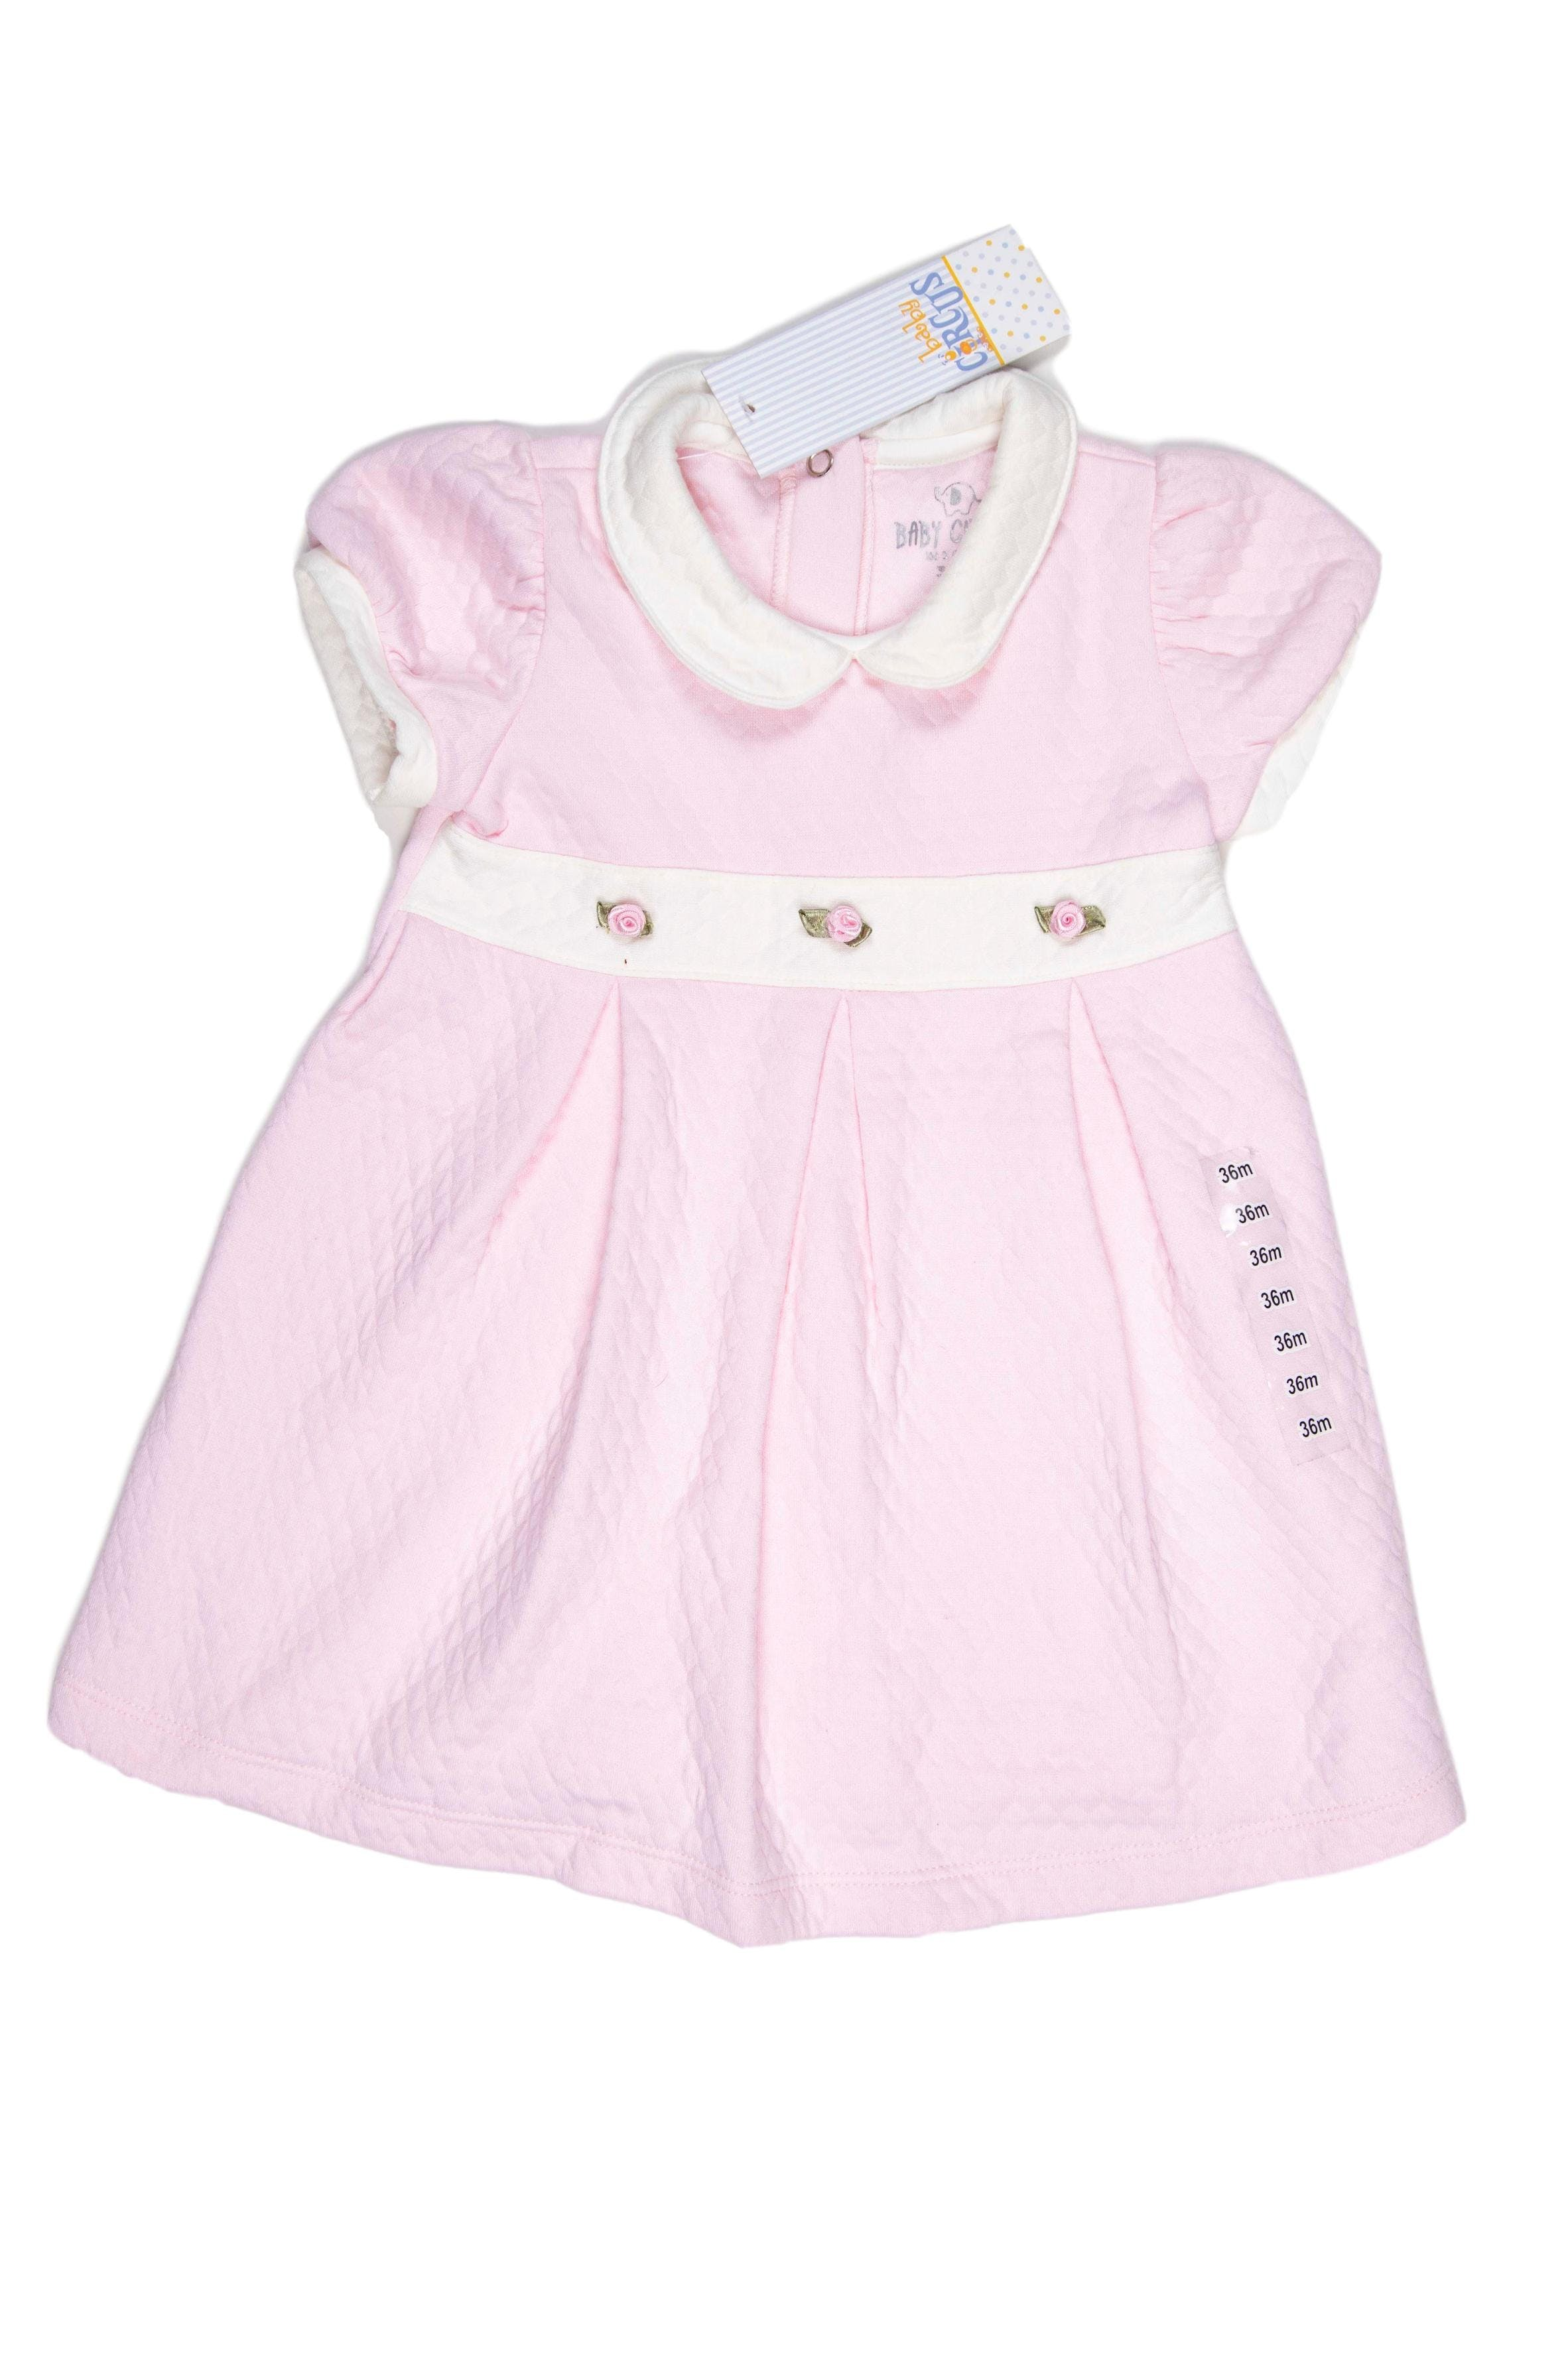 Vestido rosado algodón jacquard grueso - Circus